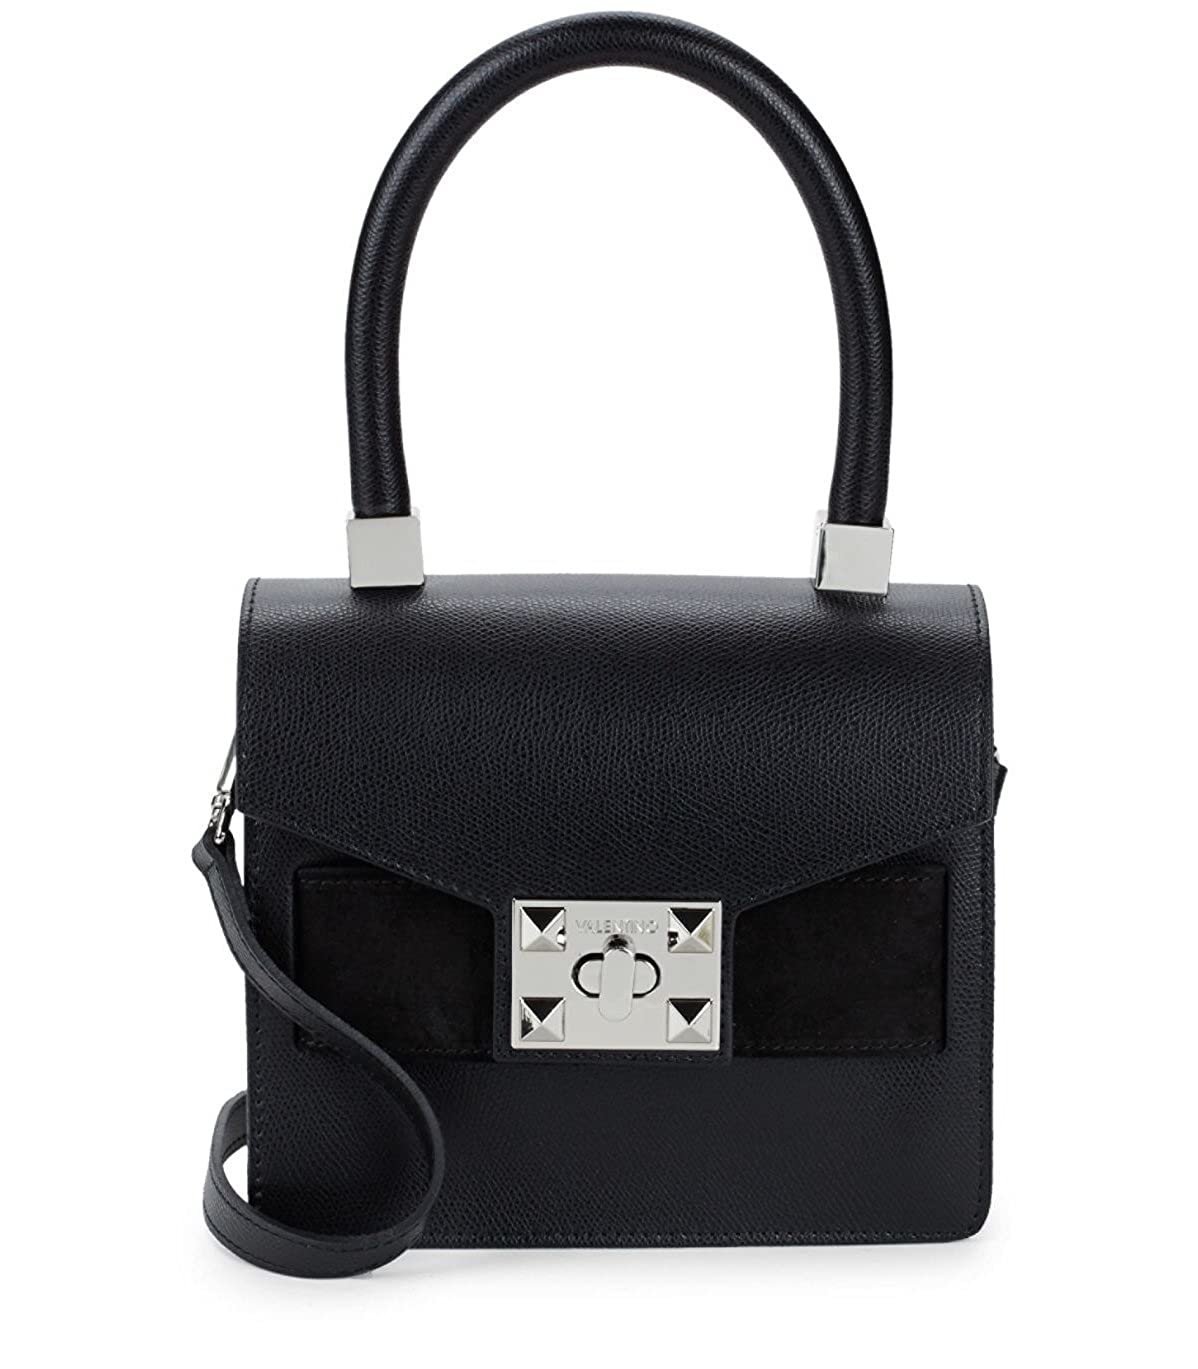 2a513ee0a657 Valentino by Mario Valentino Arlette Leather Crossbody Bag - Black   Handbags  Amazon.com